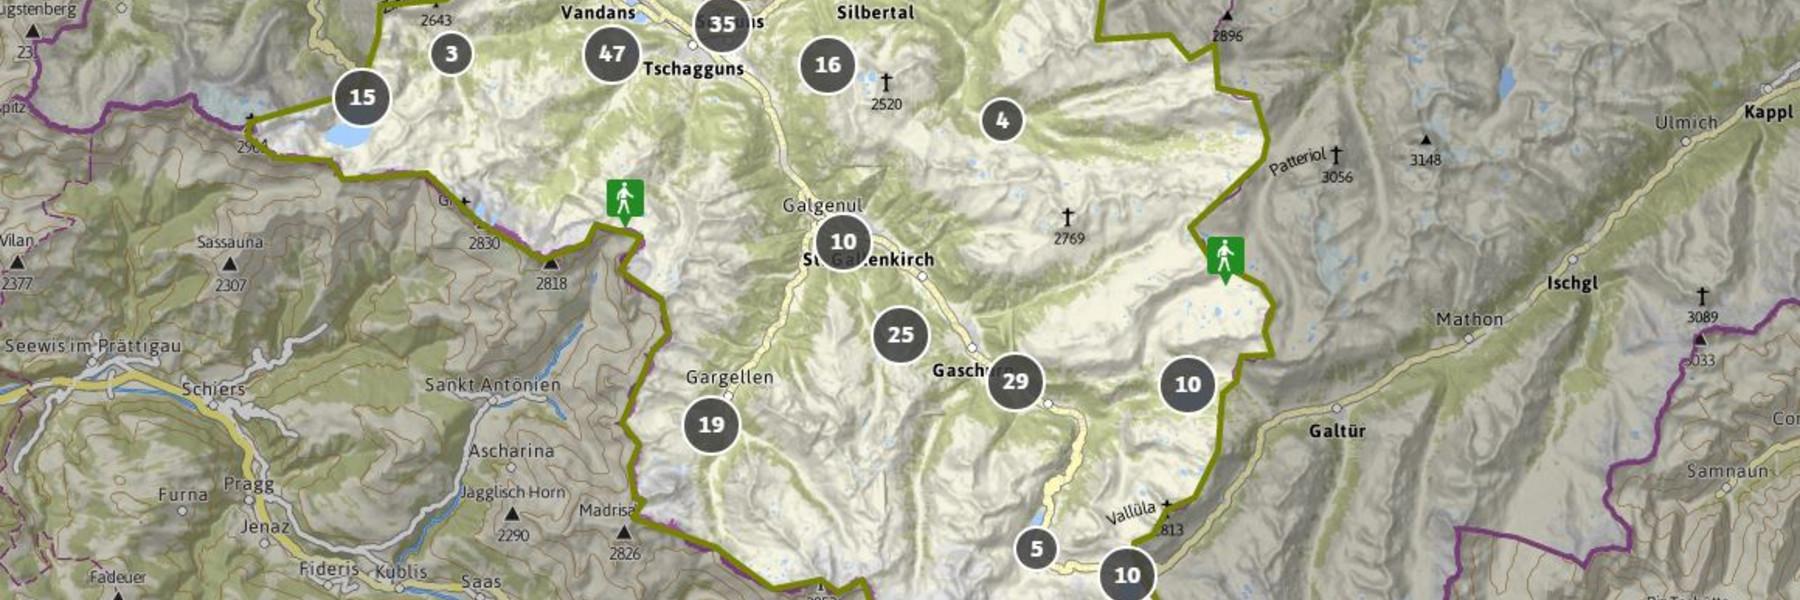 Vorarlberg Karte Berge.Wandern In Vorarlberg Im Montafon Www Montafon At